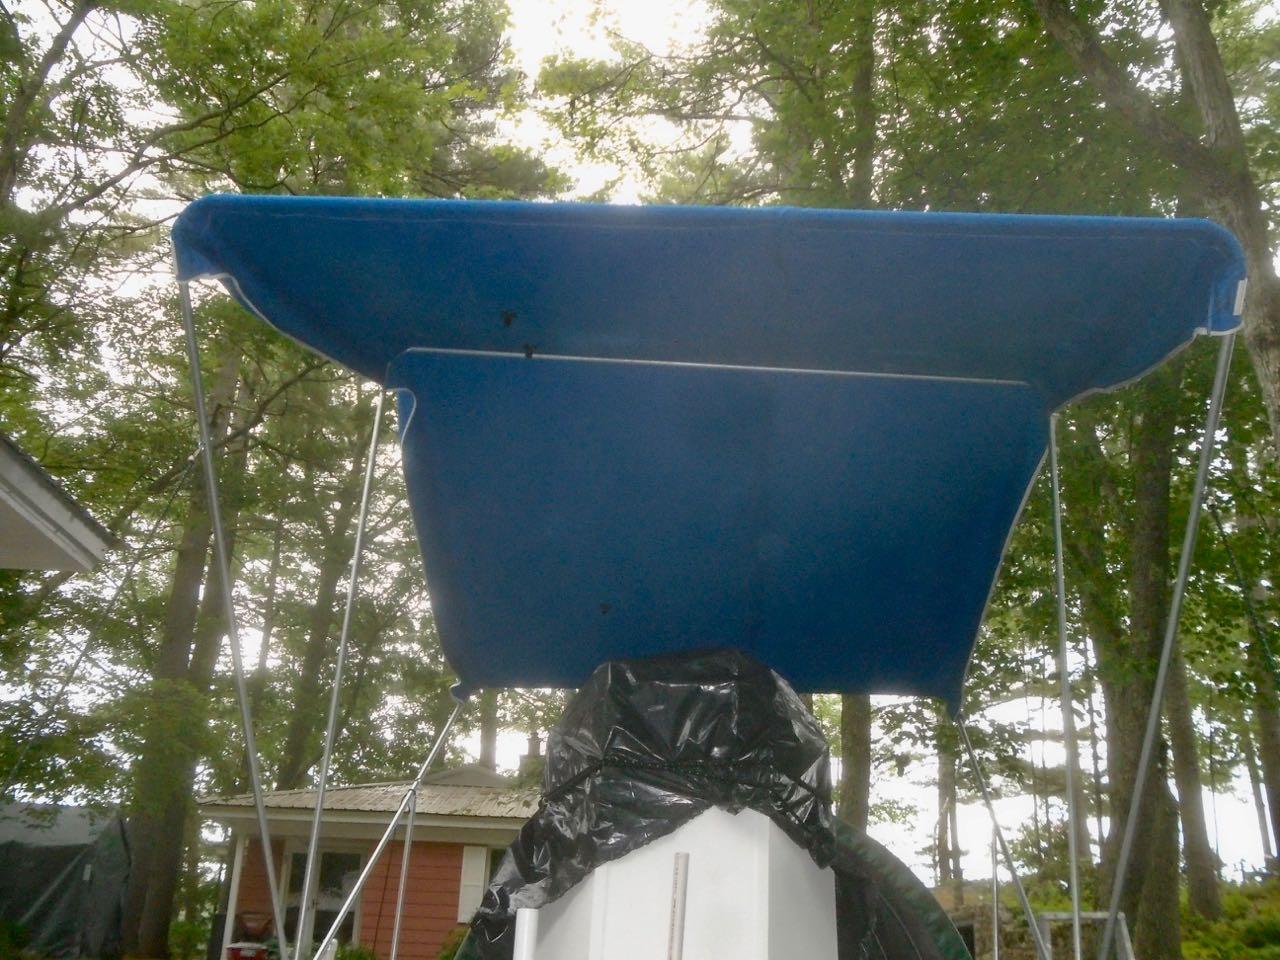 Picture of Installing the Bimini